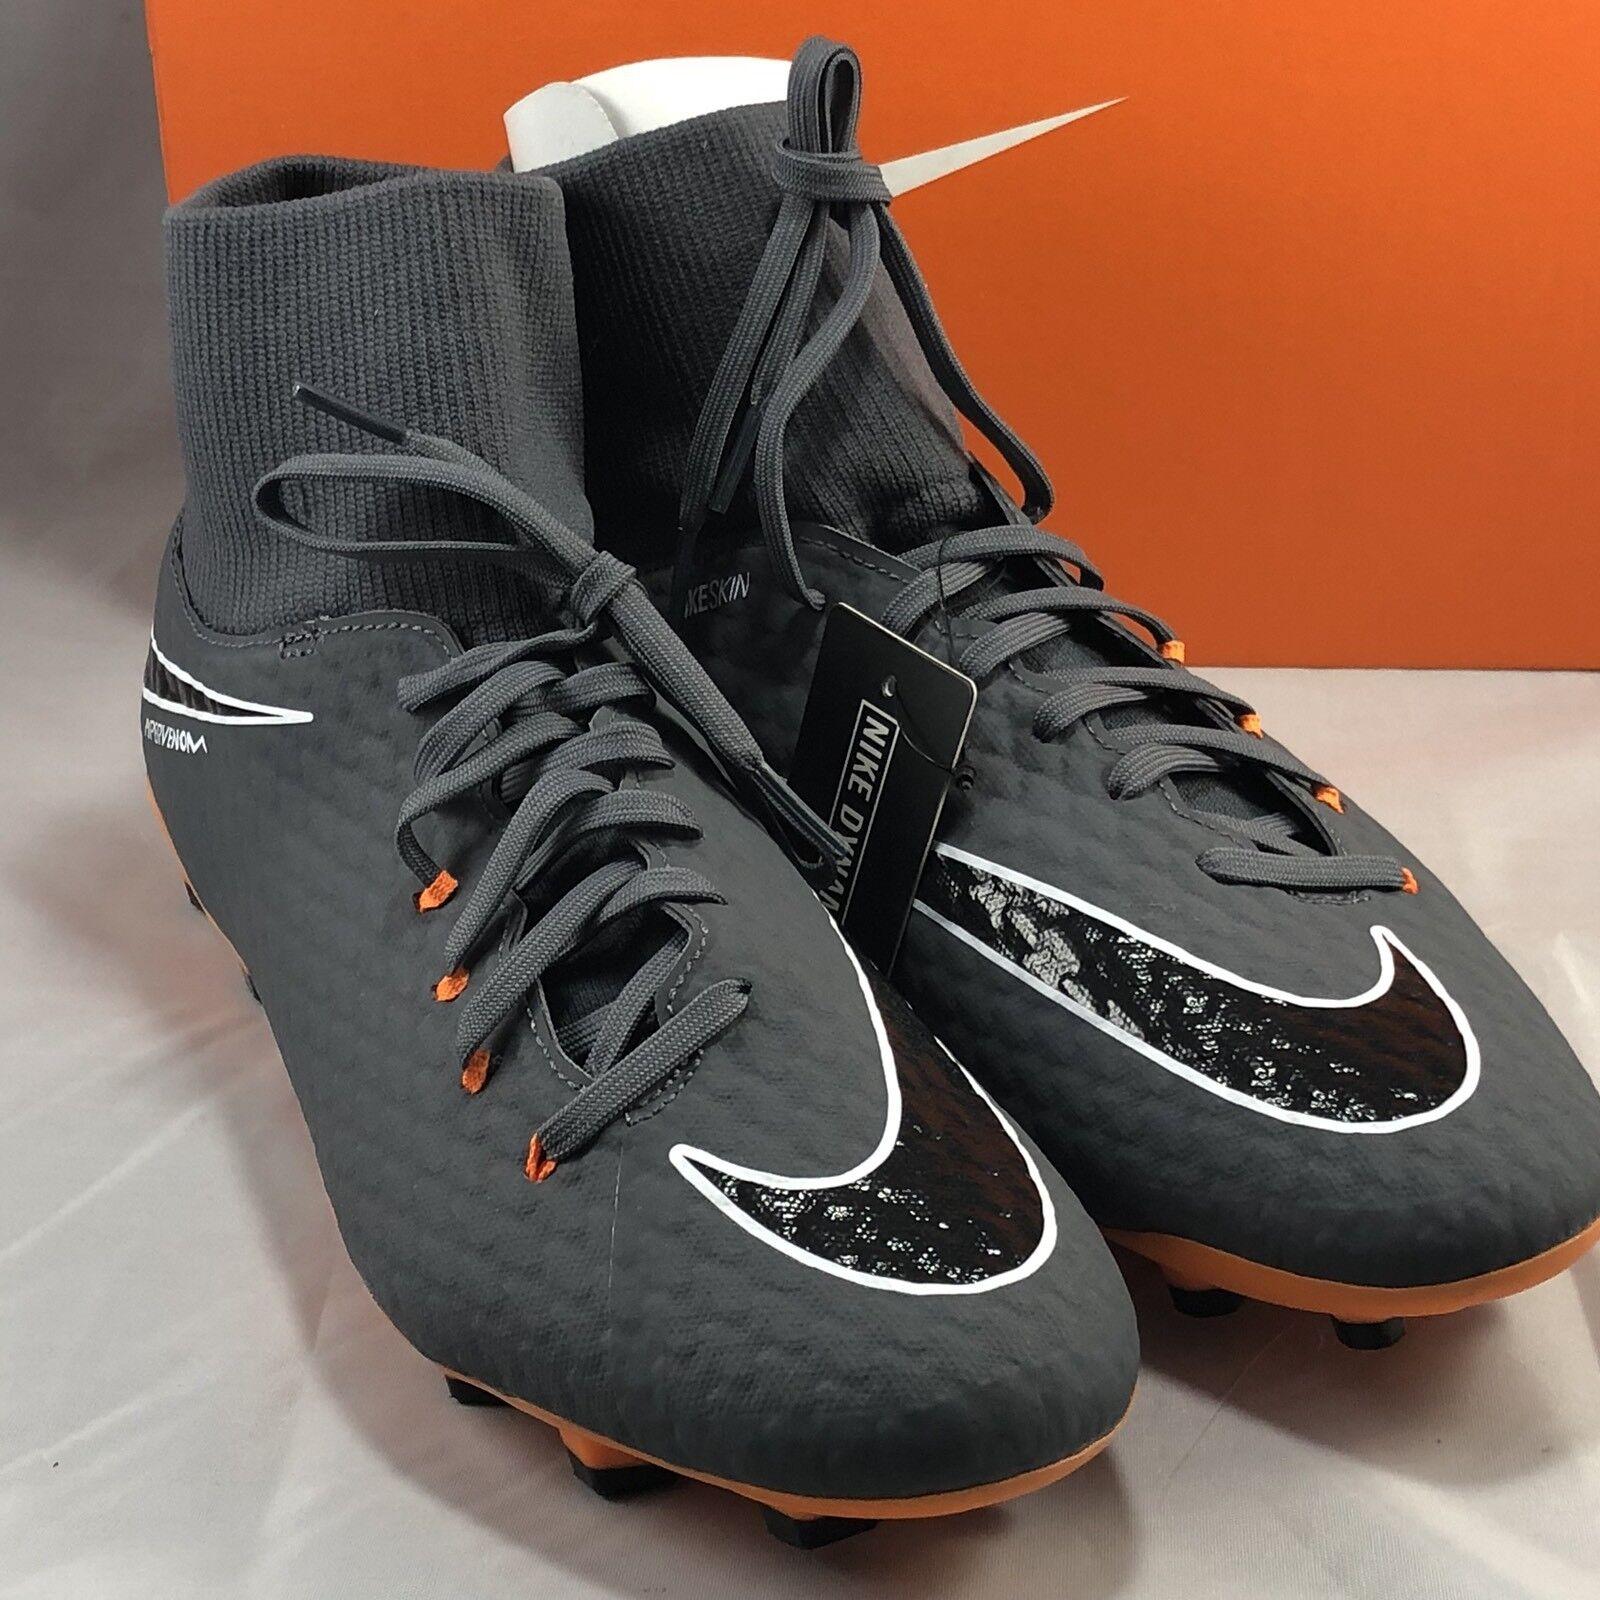 Nike Men's Hypervenom Phantom 3 Academy DF FG Size 11.5 (AH7268 081)